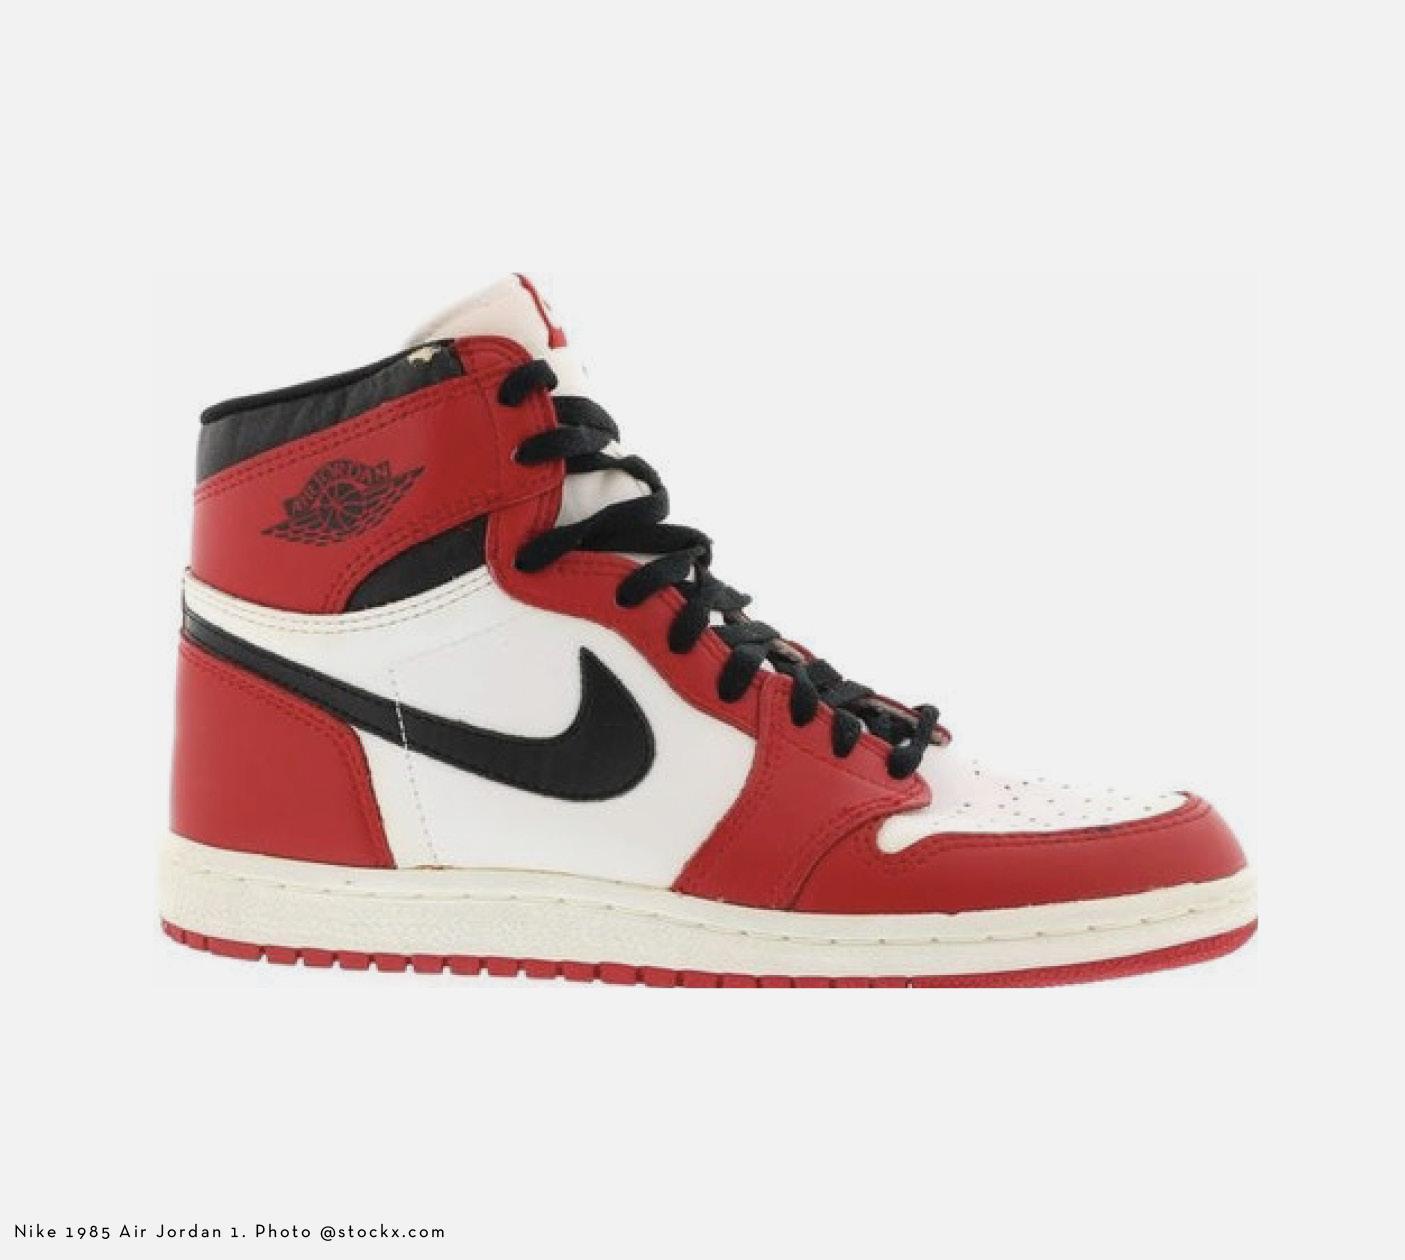 Archive Culture Mens Style - Nike 1985 Air Jordan 1